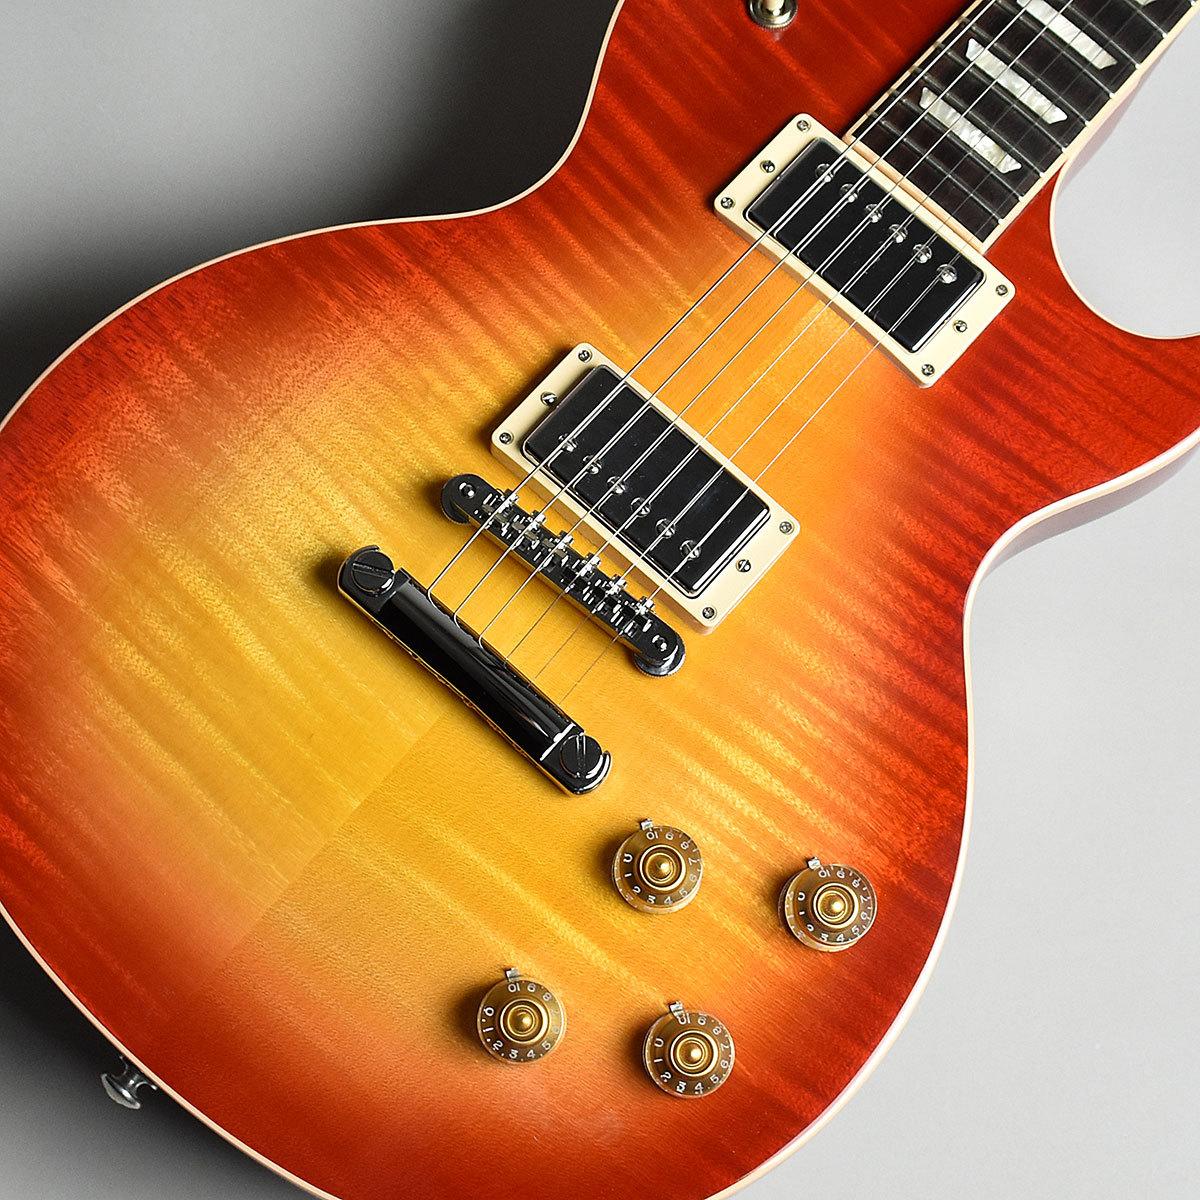 Gibson Les Paul Heritage Traditional Paul Pro Sunburst Plus 2017 Limited Heritage Cherry Sunburst レスポール トラディショナル【ギブソン】【新宿PePe店】, ここあーる:c0328379 --- sunward.msk.ru